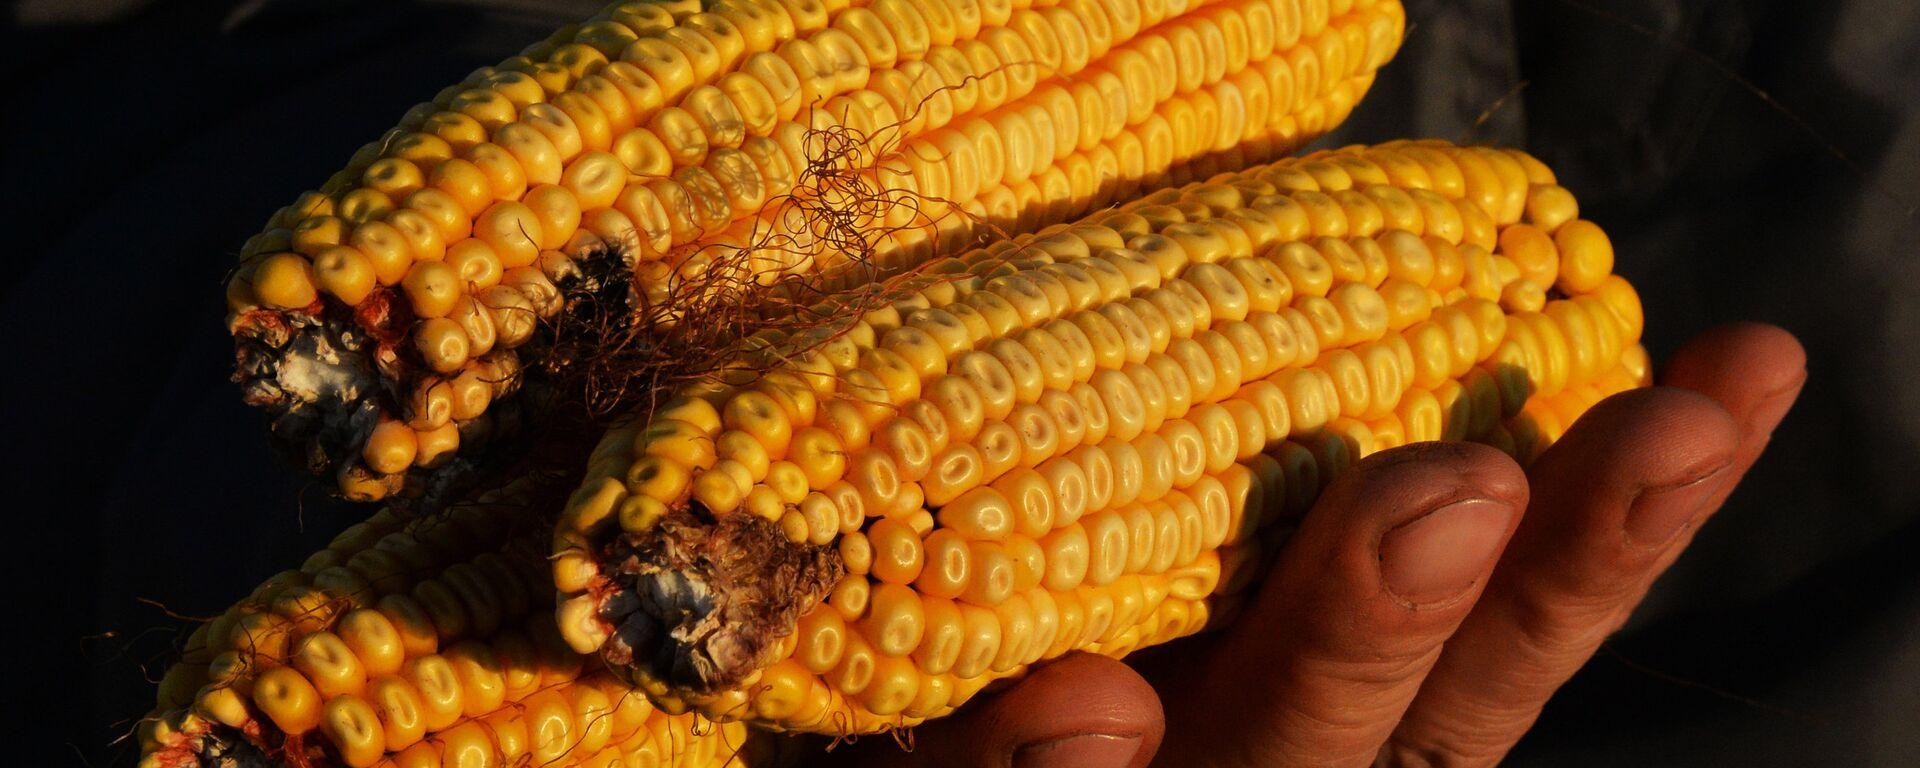 Mazorcas de maíz - Sputnik Mundo, 1920, 27.08.2021